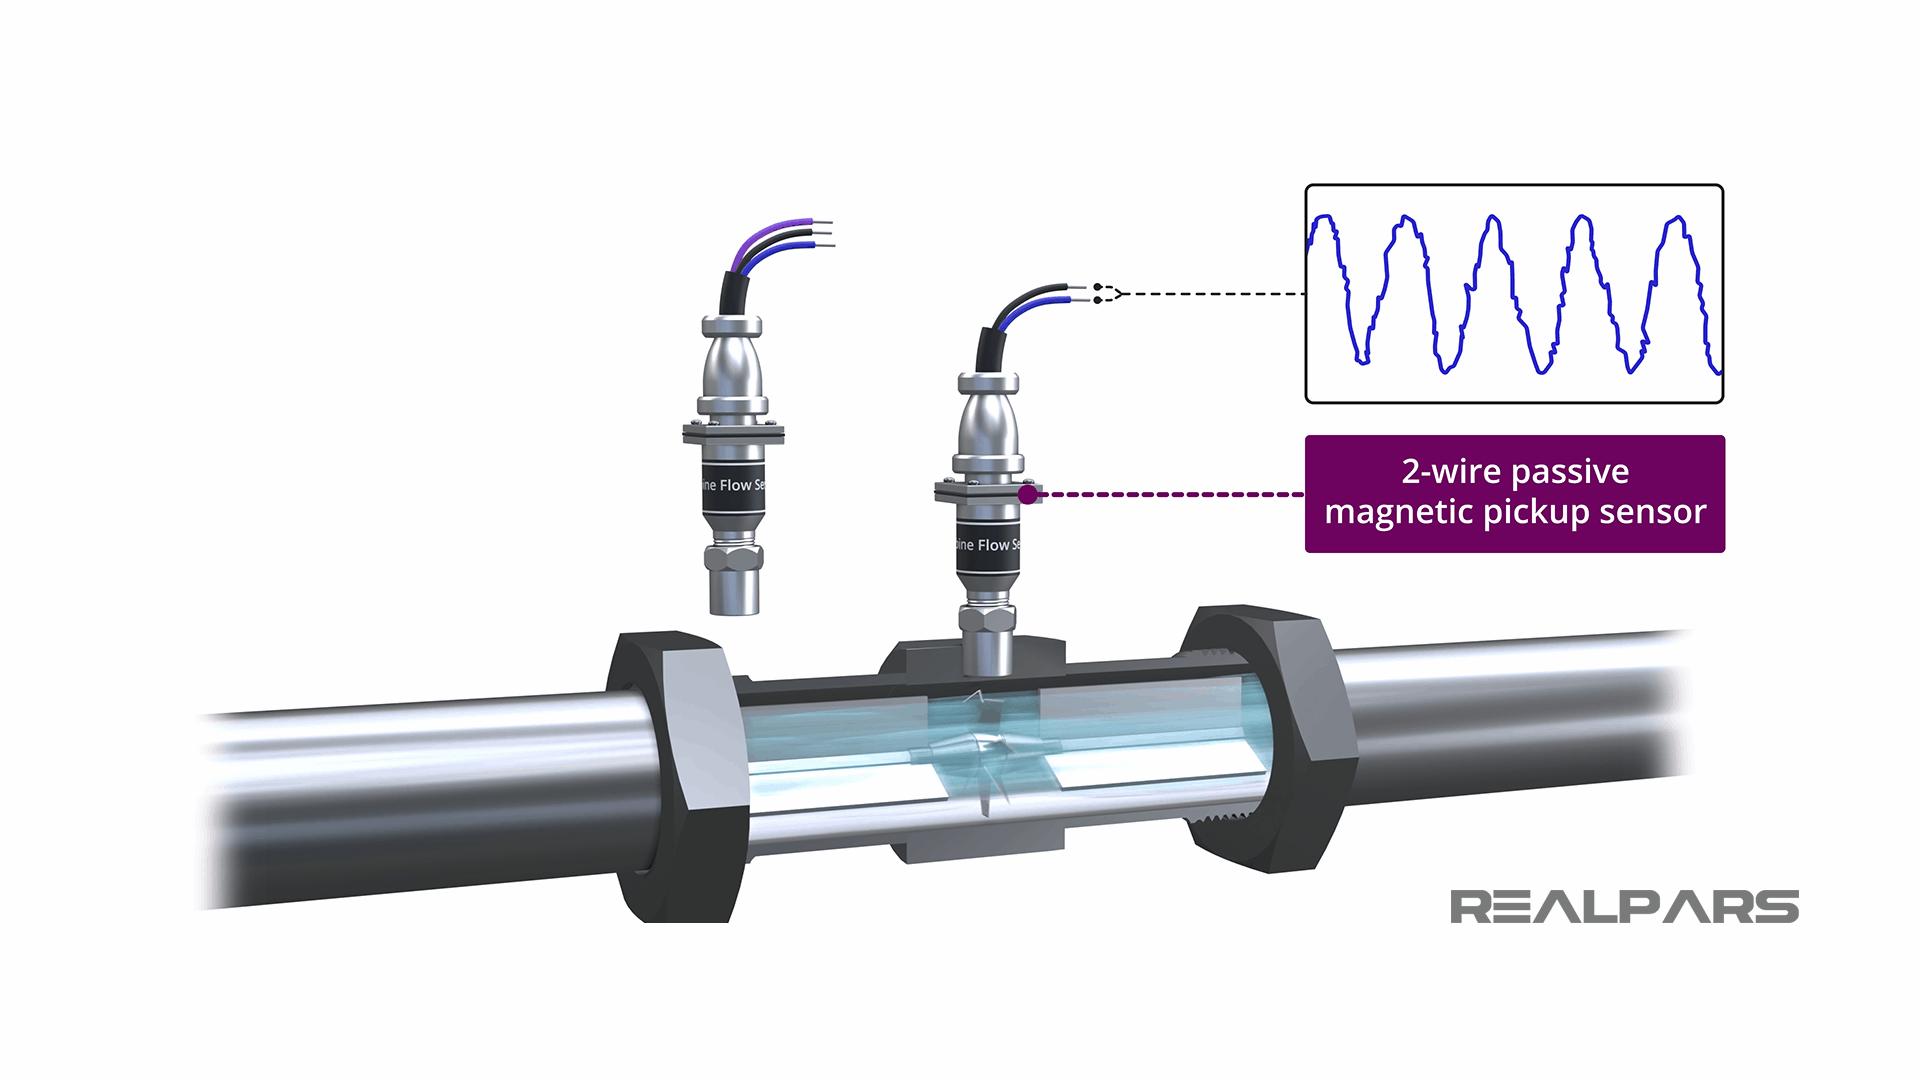 2-wire passive magnetic pickup sensor